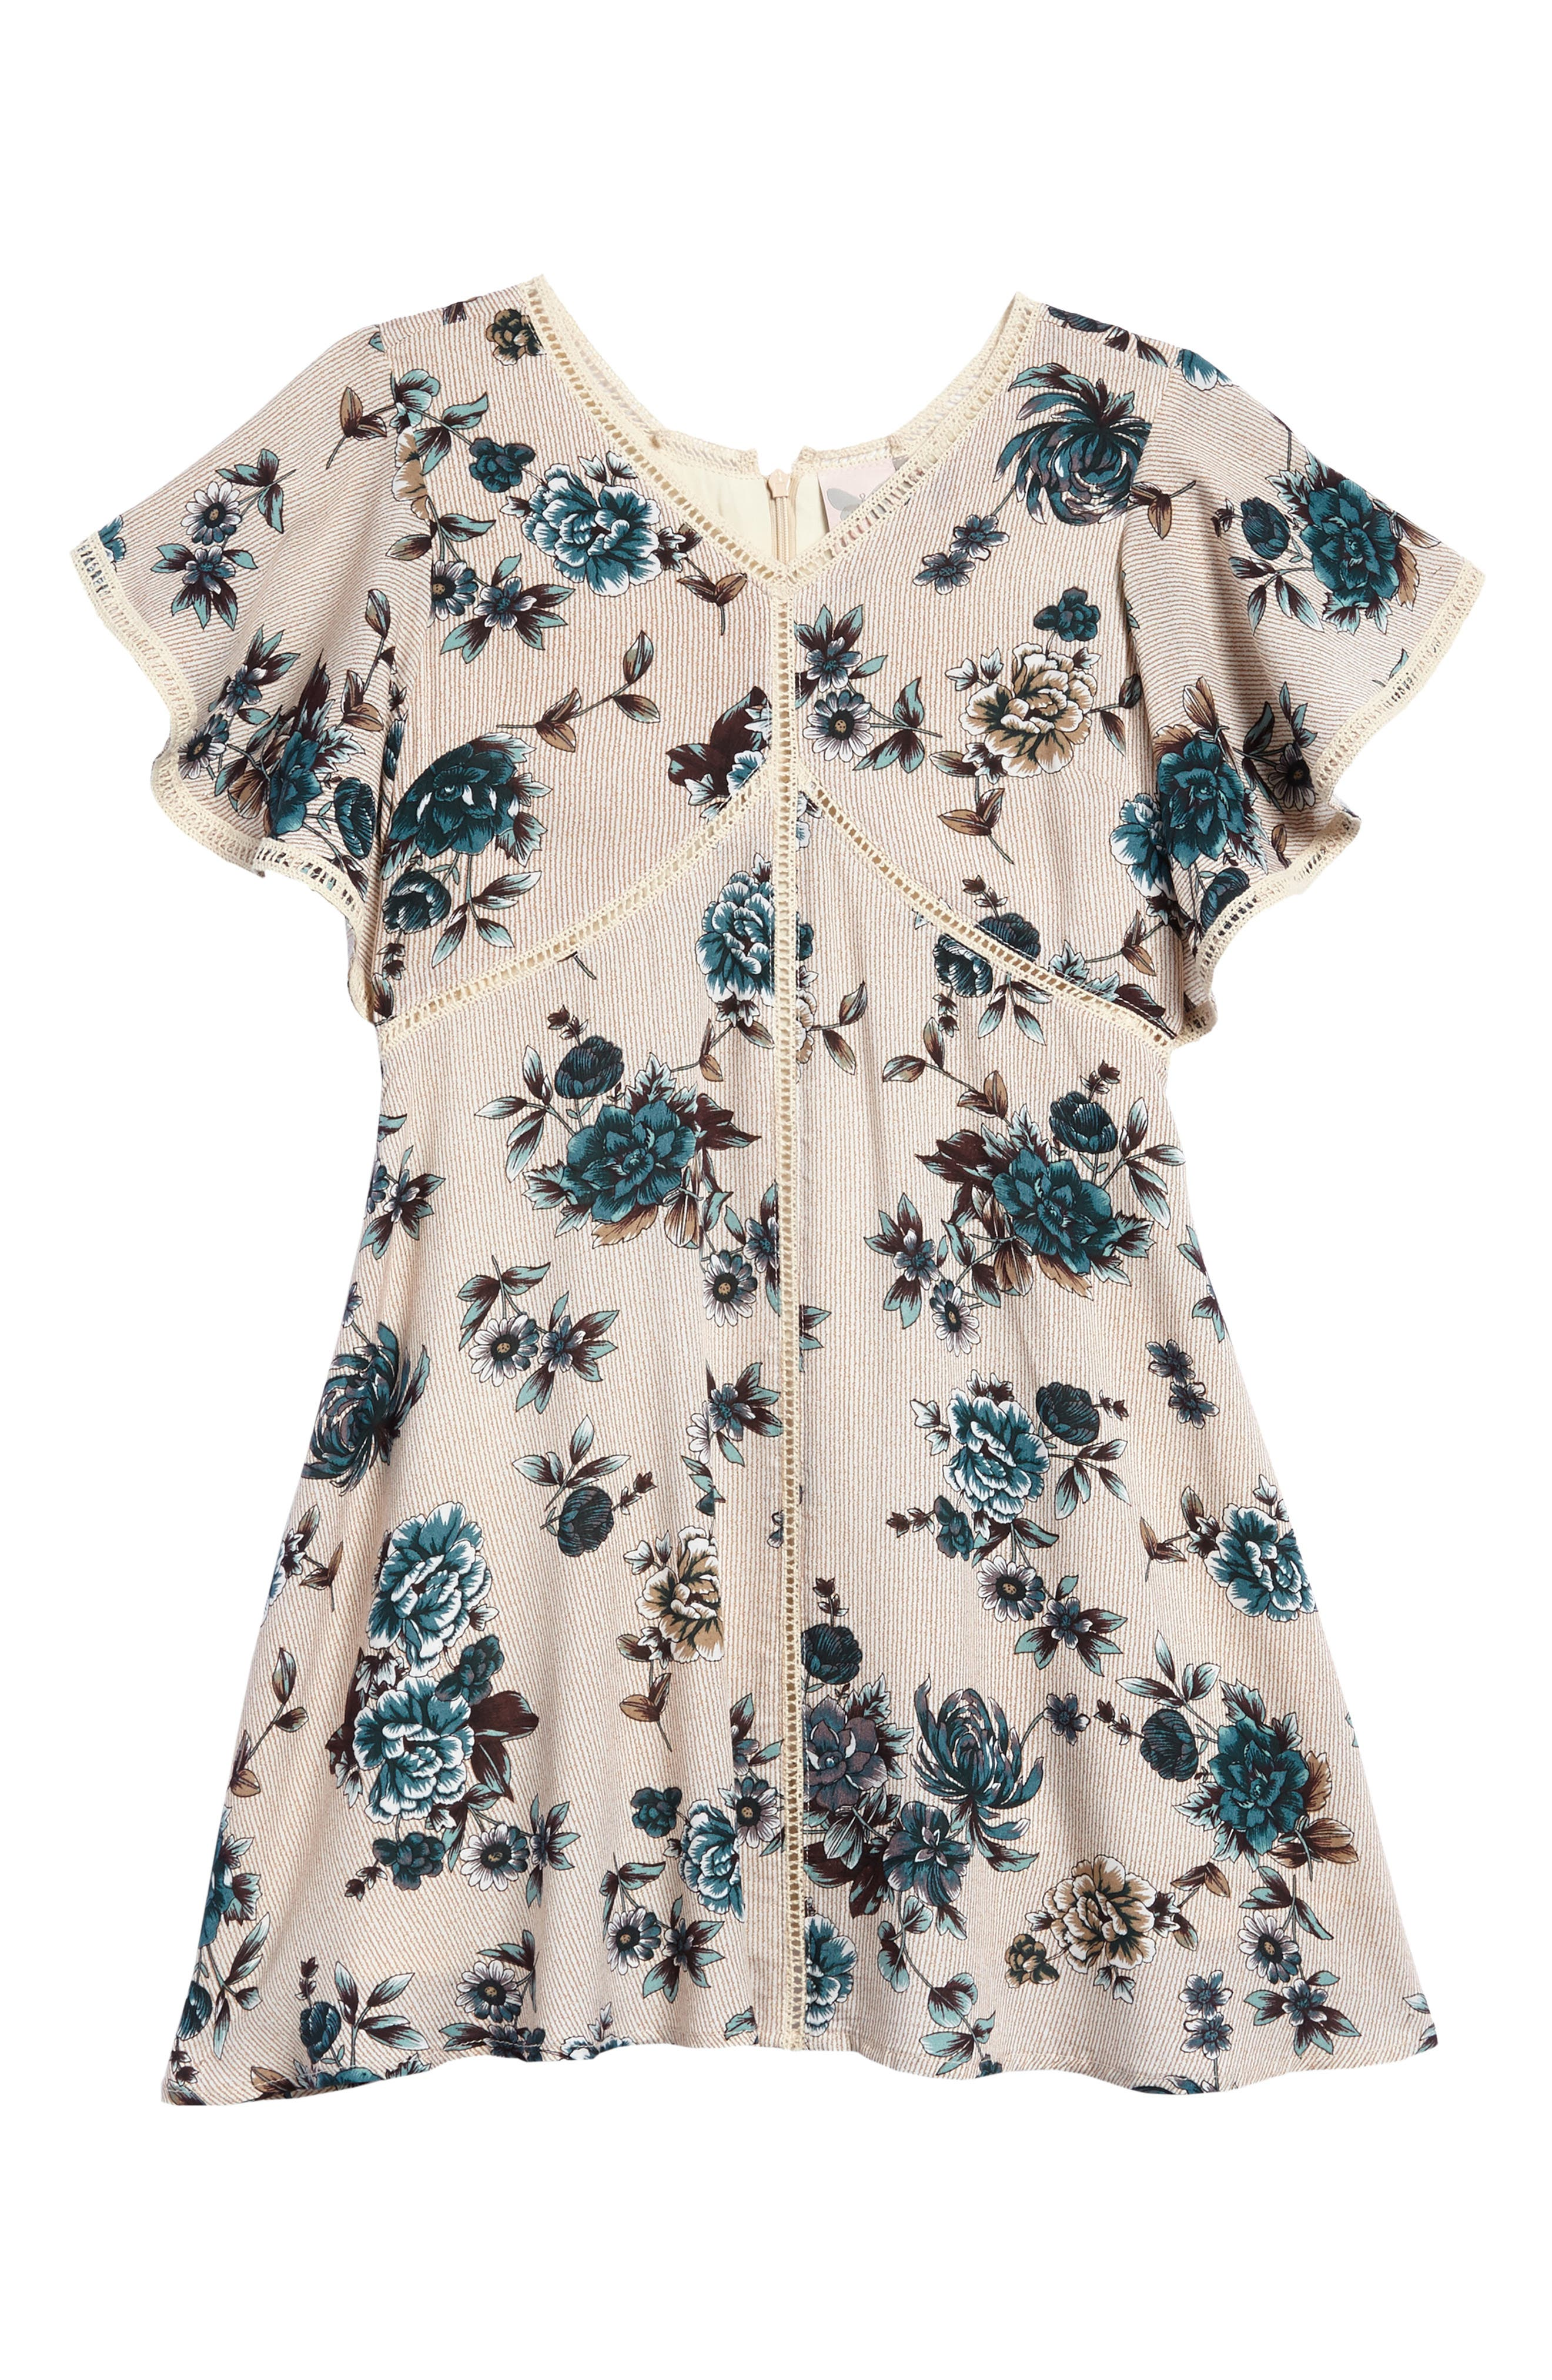 Floral Print Ruffle Sleeve Dress,                             Main thumbnail 1, color,                             250